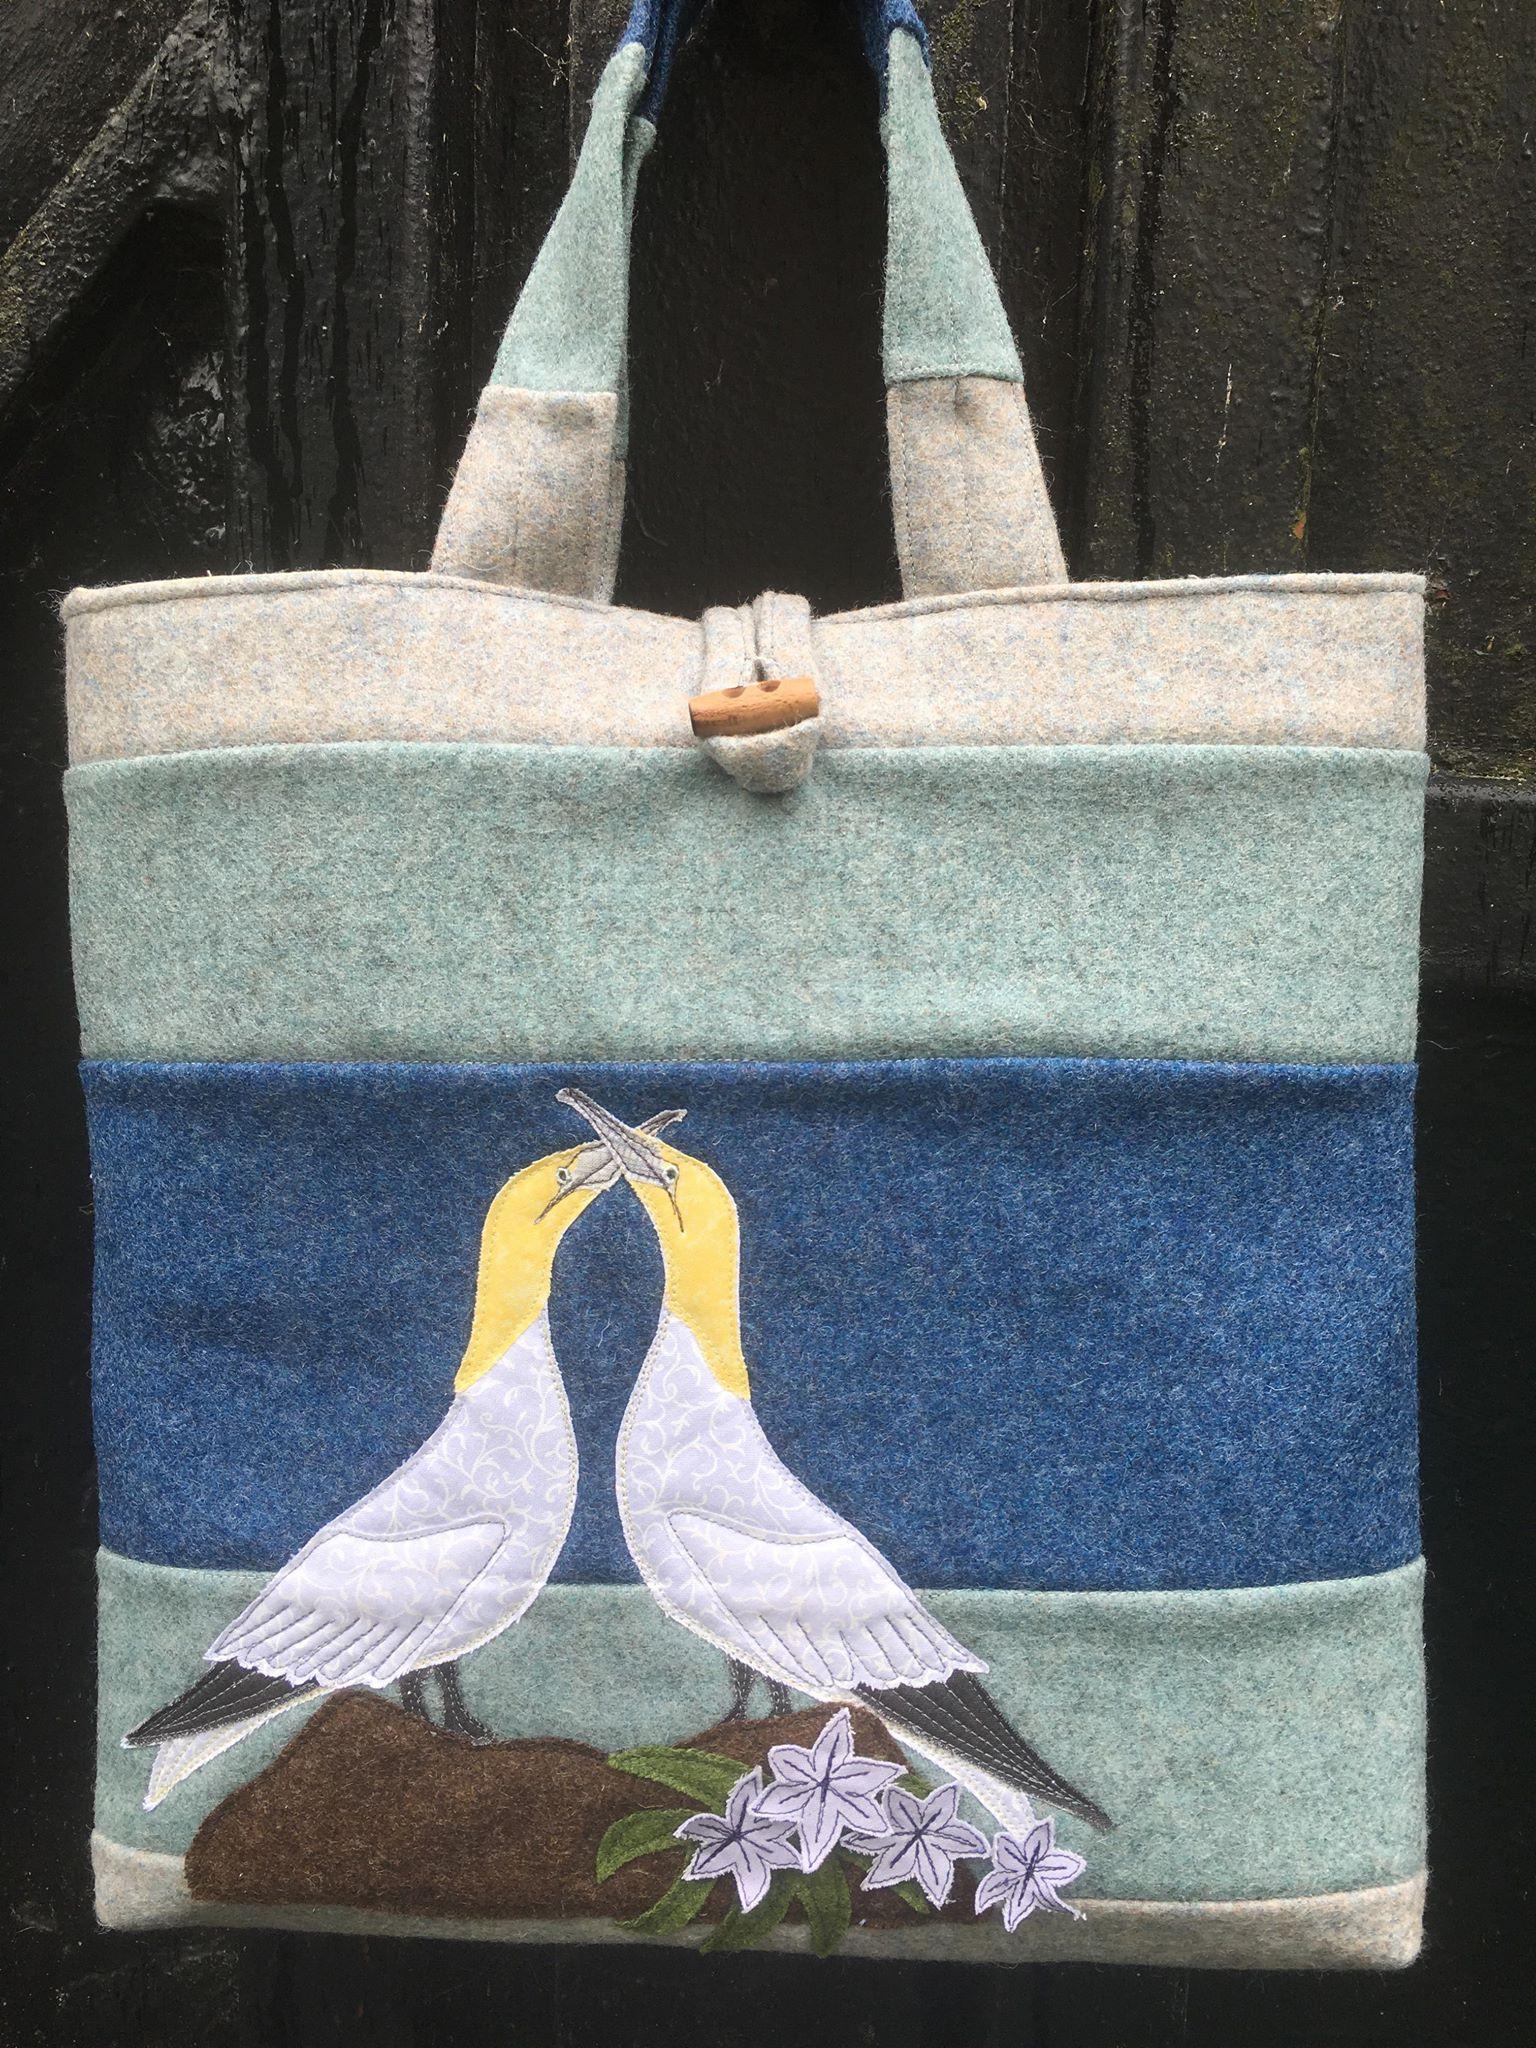 Mels Bag, Tote Bag Sewing Pattern